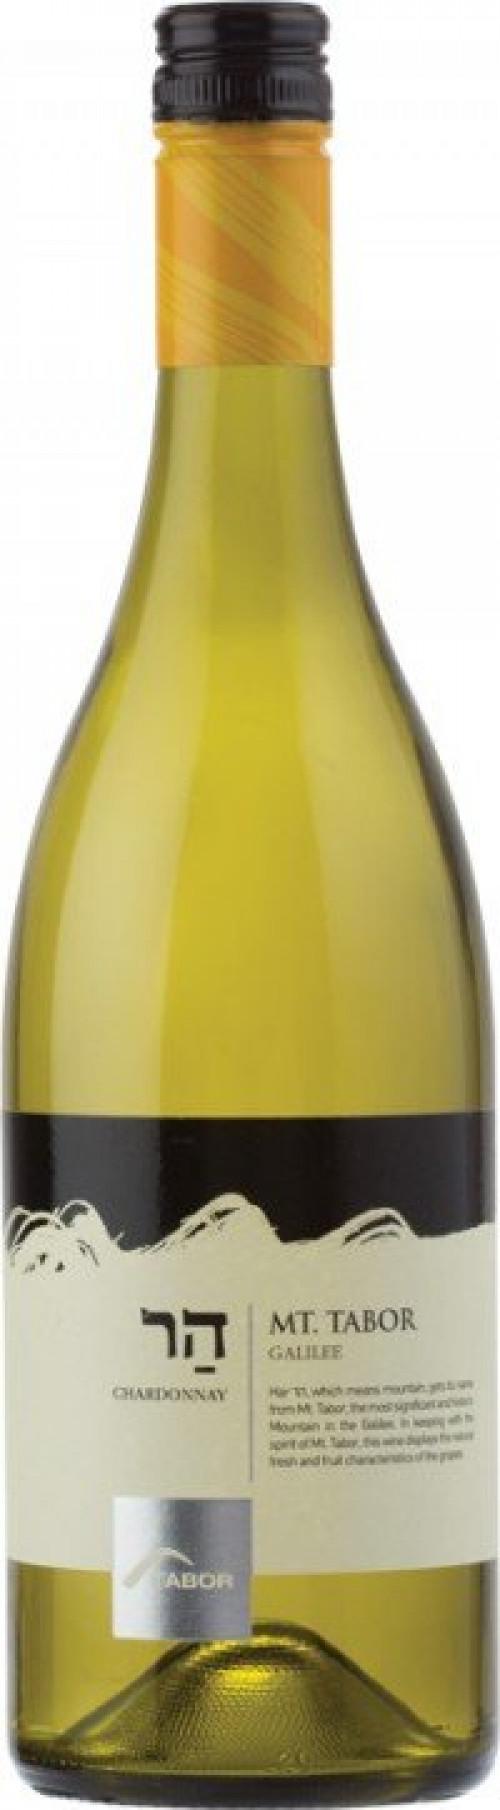 2018 Mt. Tabor Chardonnay 750ml